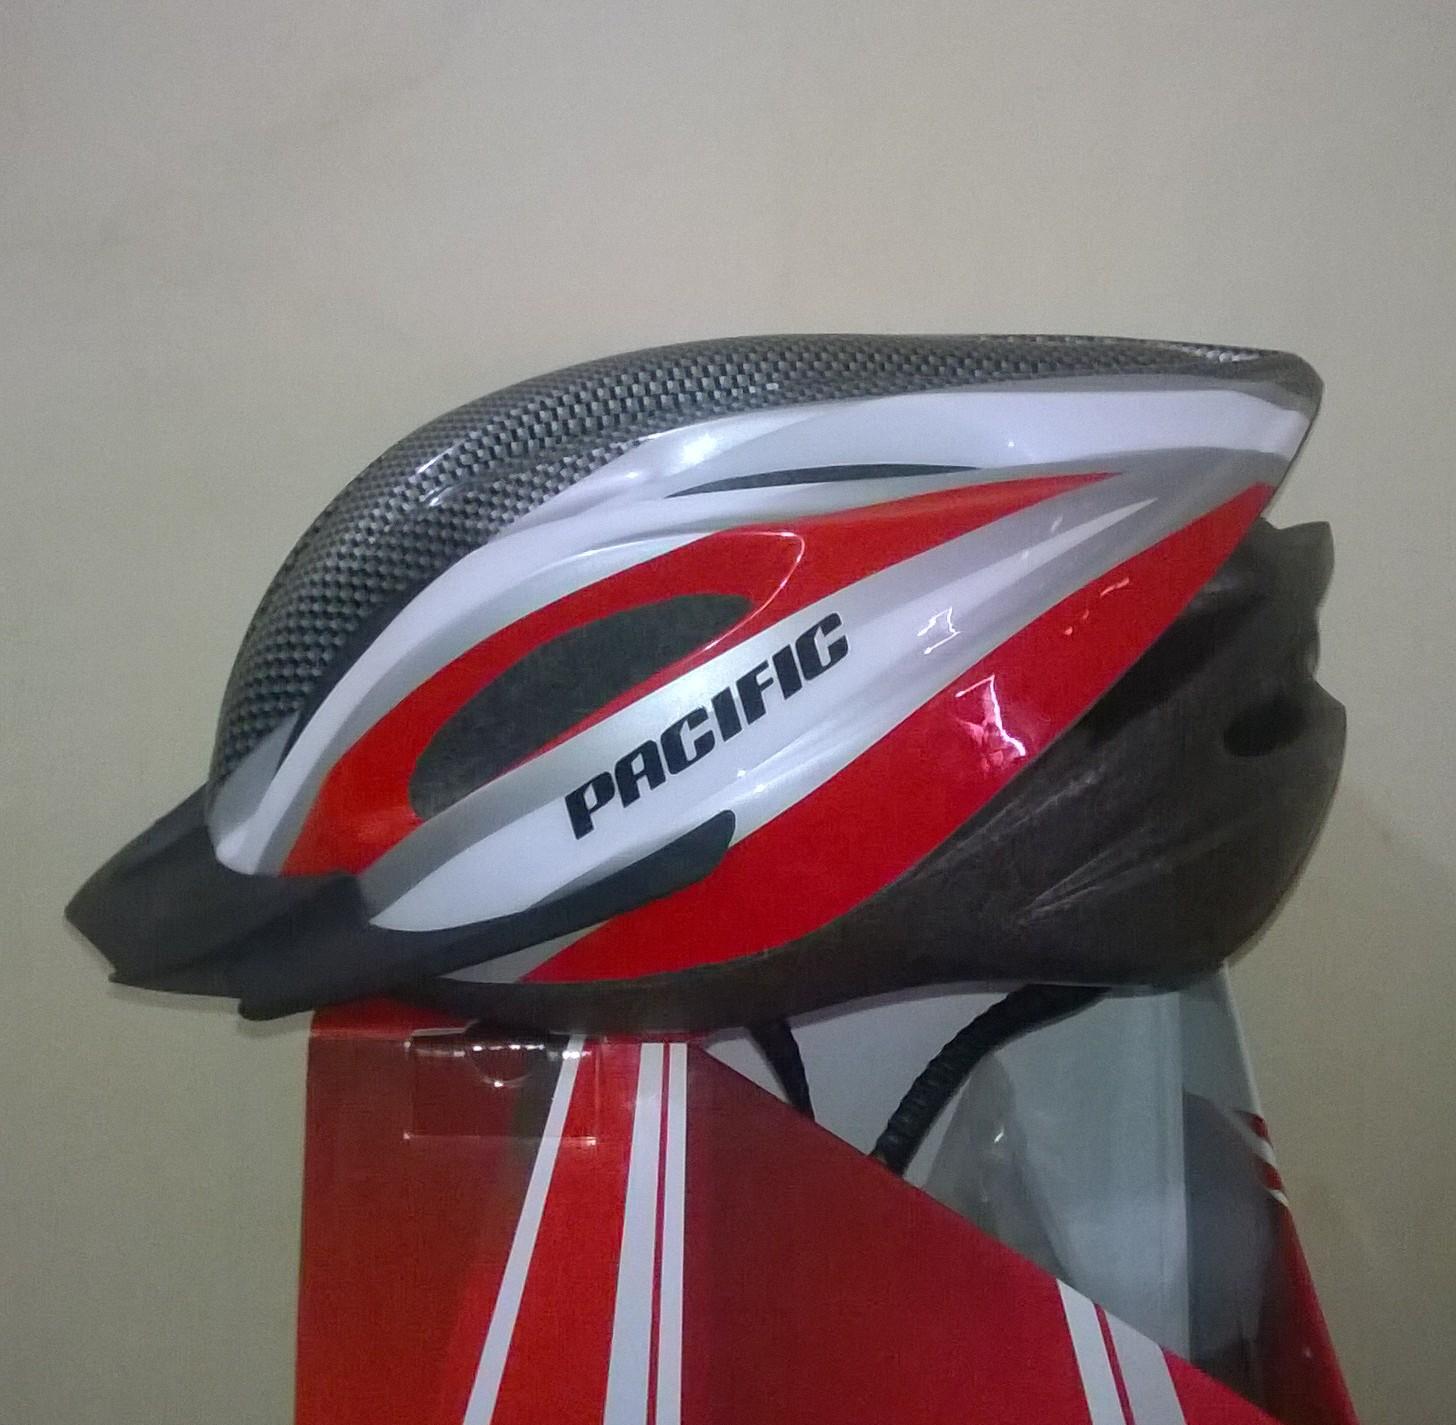 Helm Sepeda Merk Pacific 808 Elevenia Lipat Keren Modis Aman Overade Plixi White Jual Cek Harga Di Pricearea